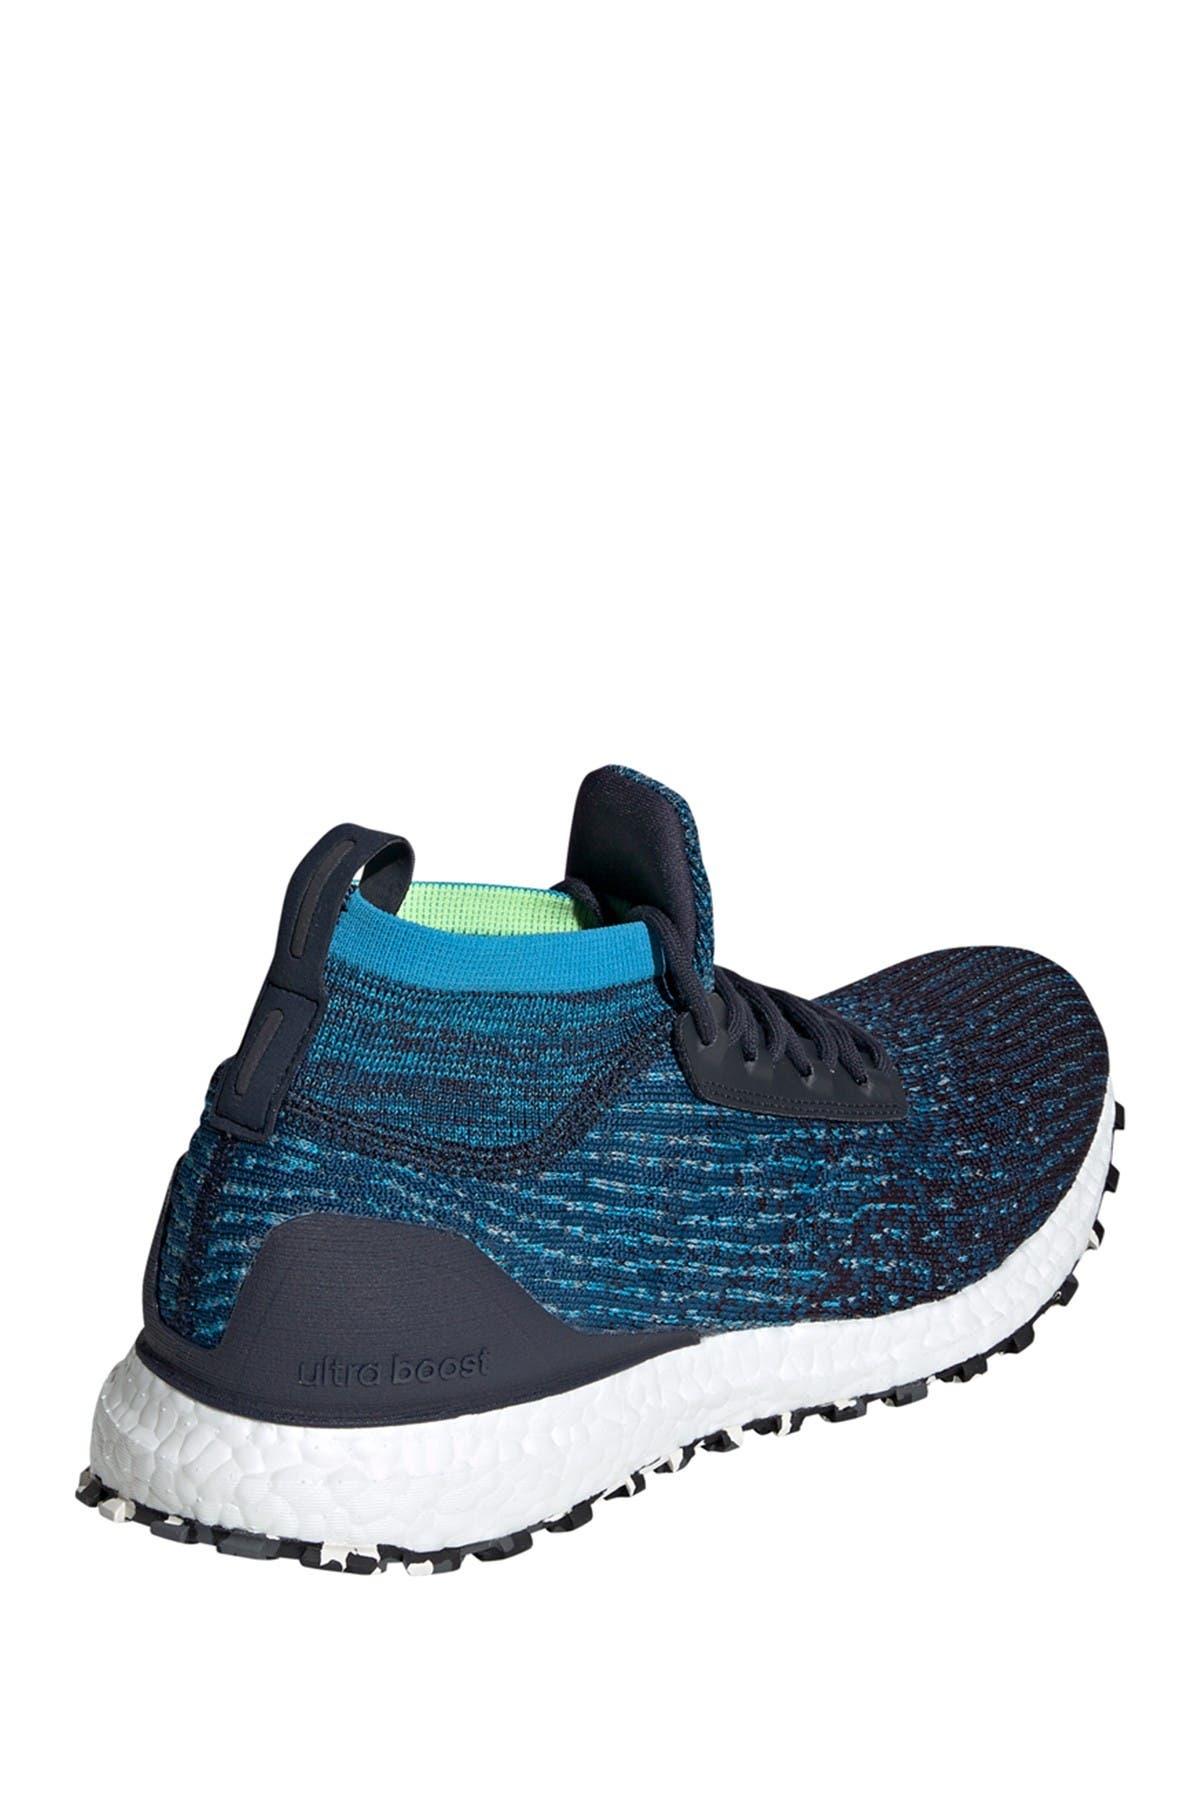 adidas all terrain waterproof